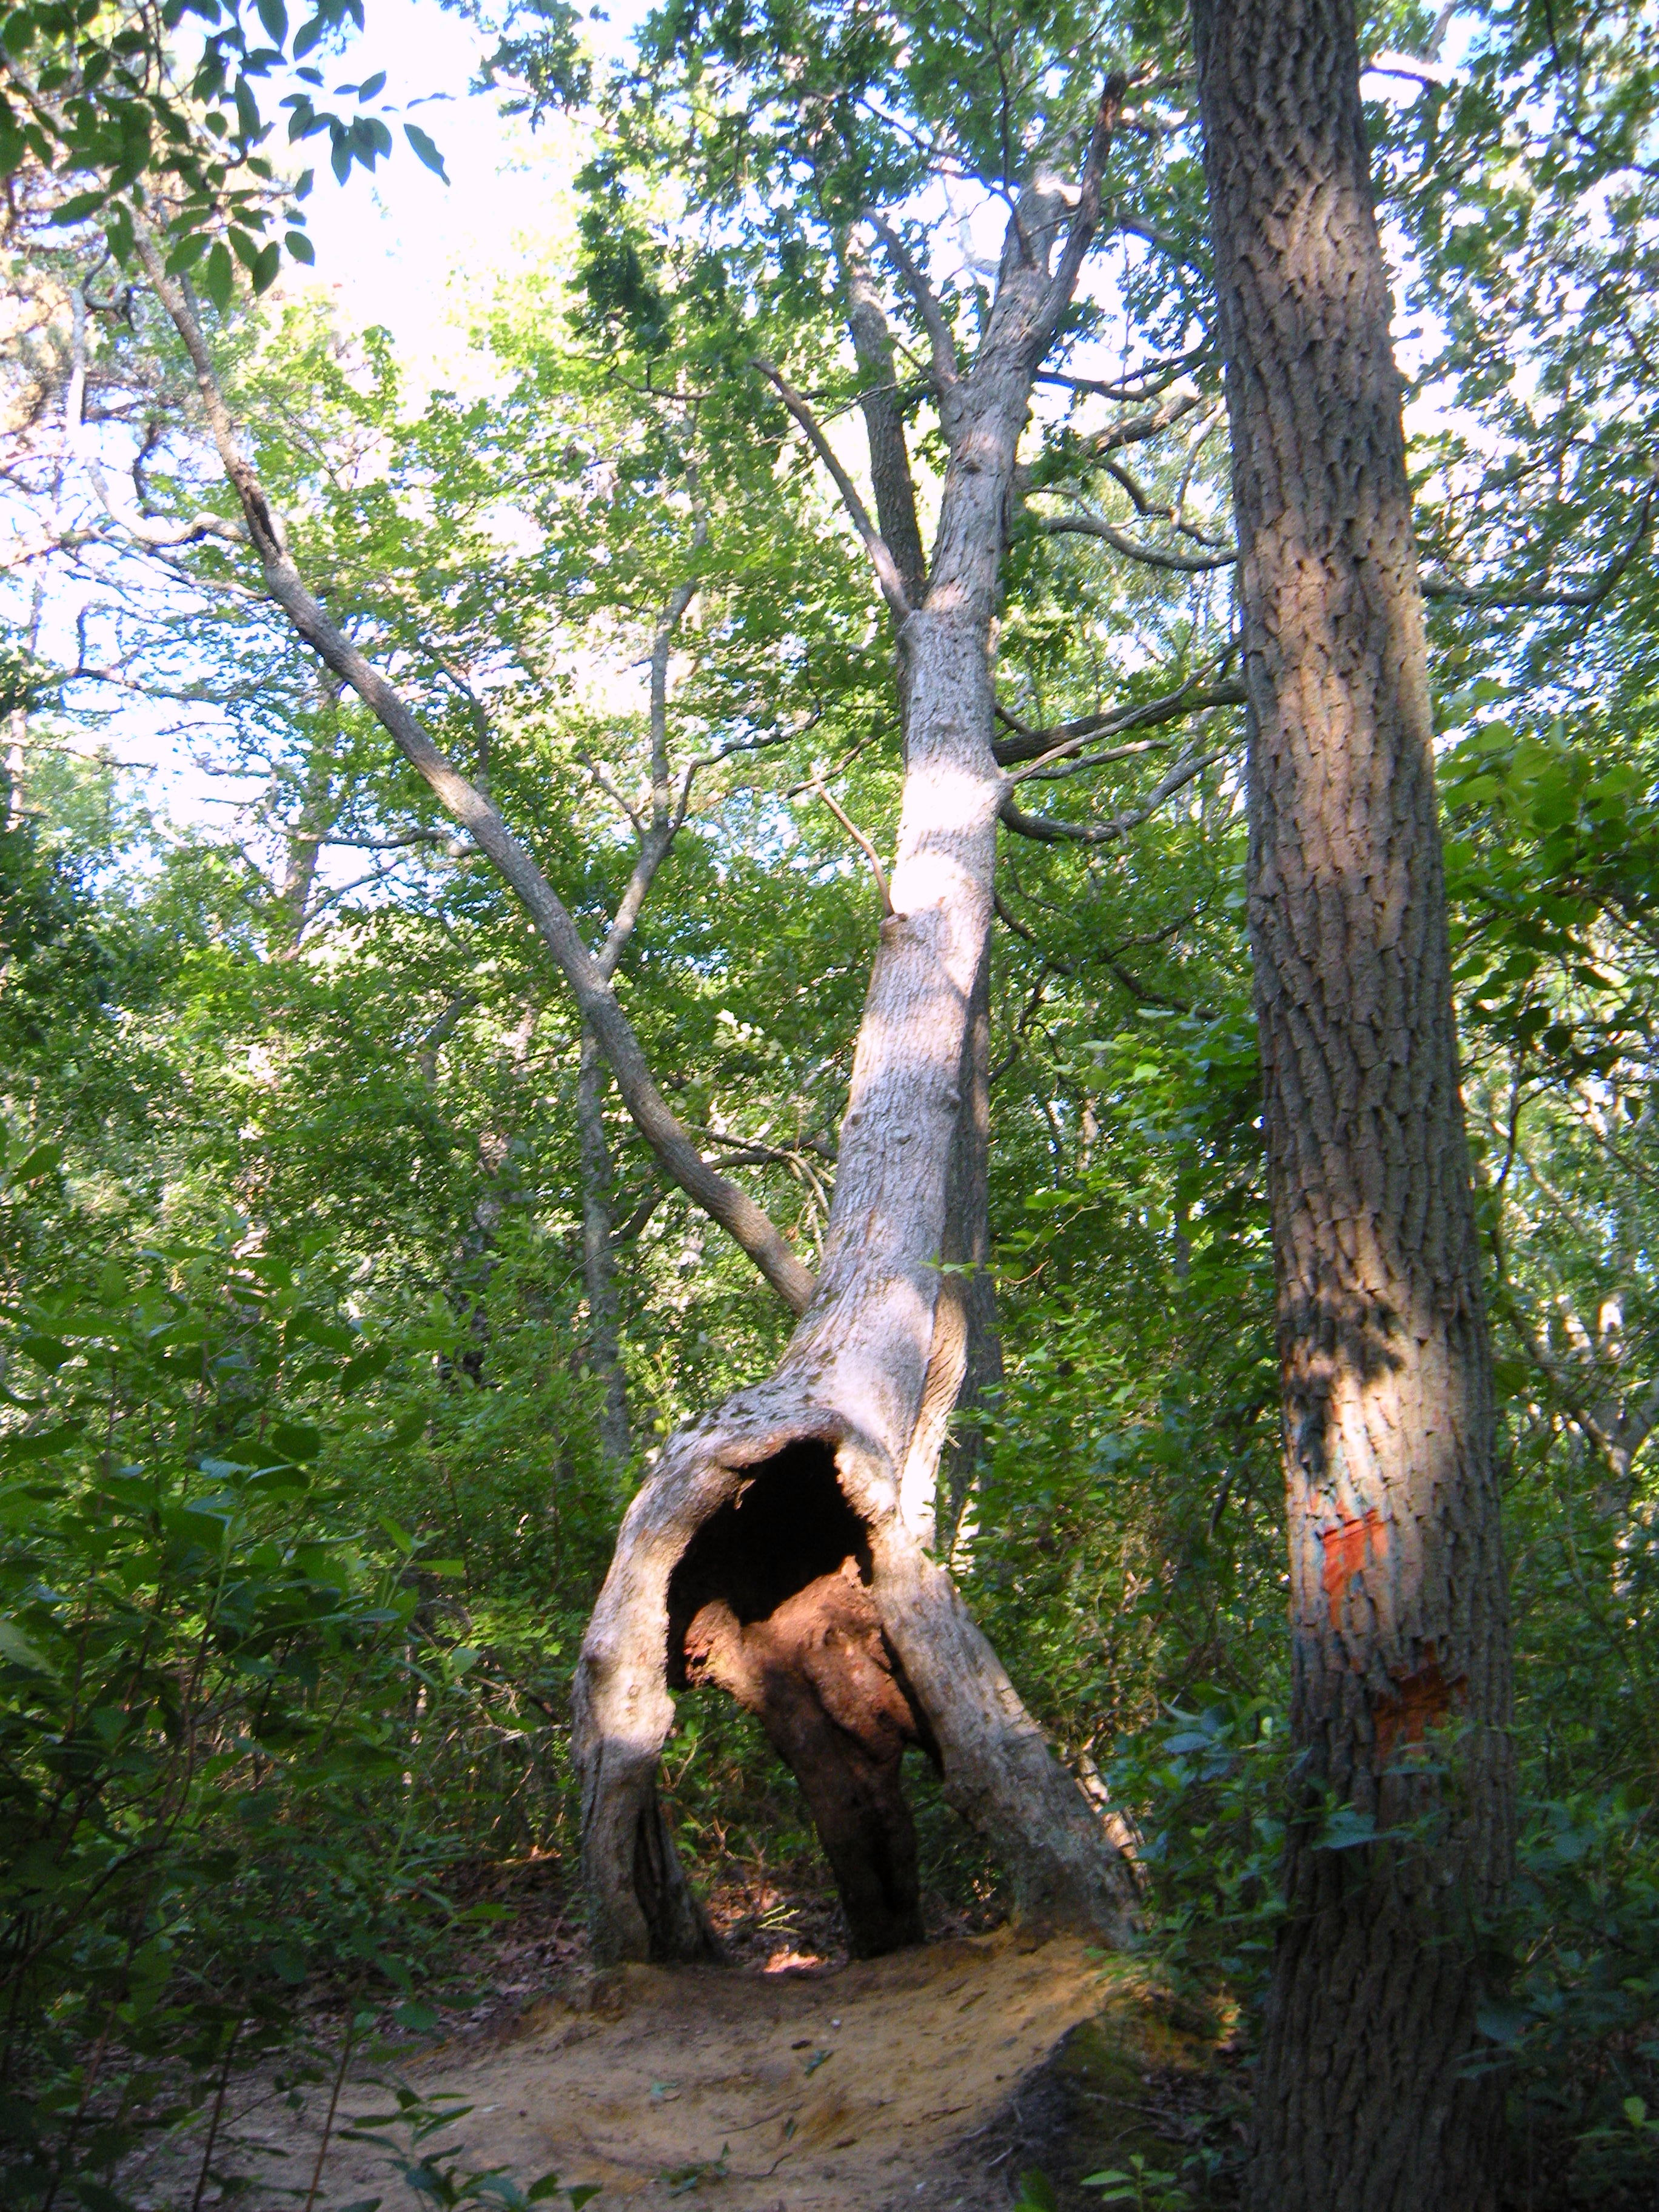 Deformed Tree Stumps, Trees, Wood, Stumps, Roots, HQ Photo